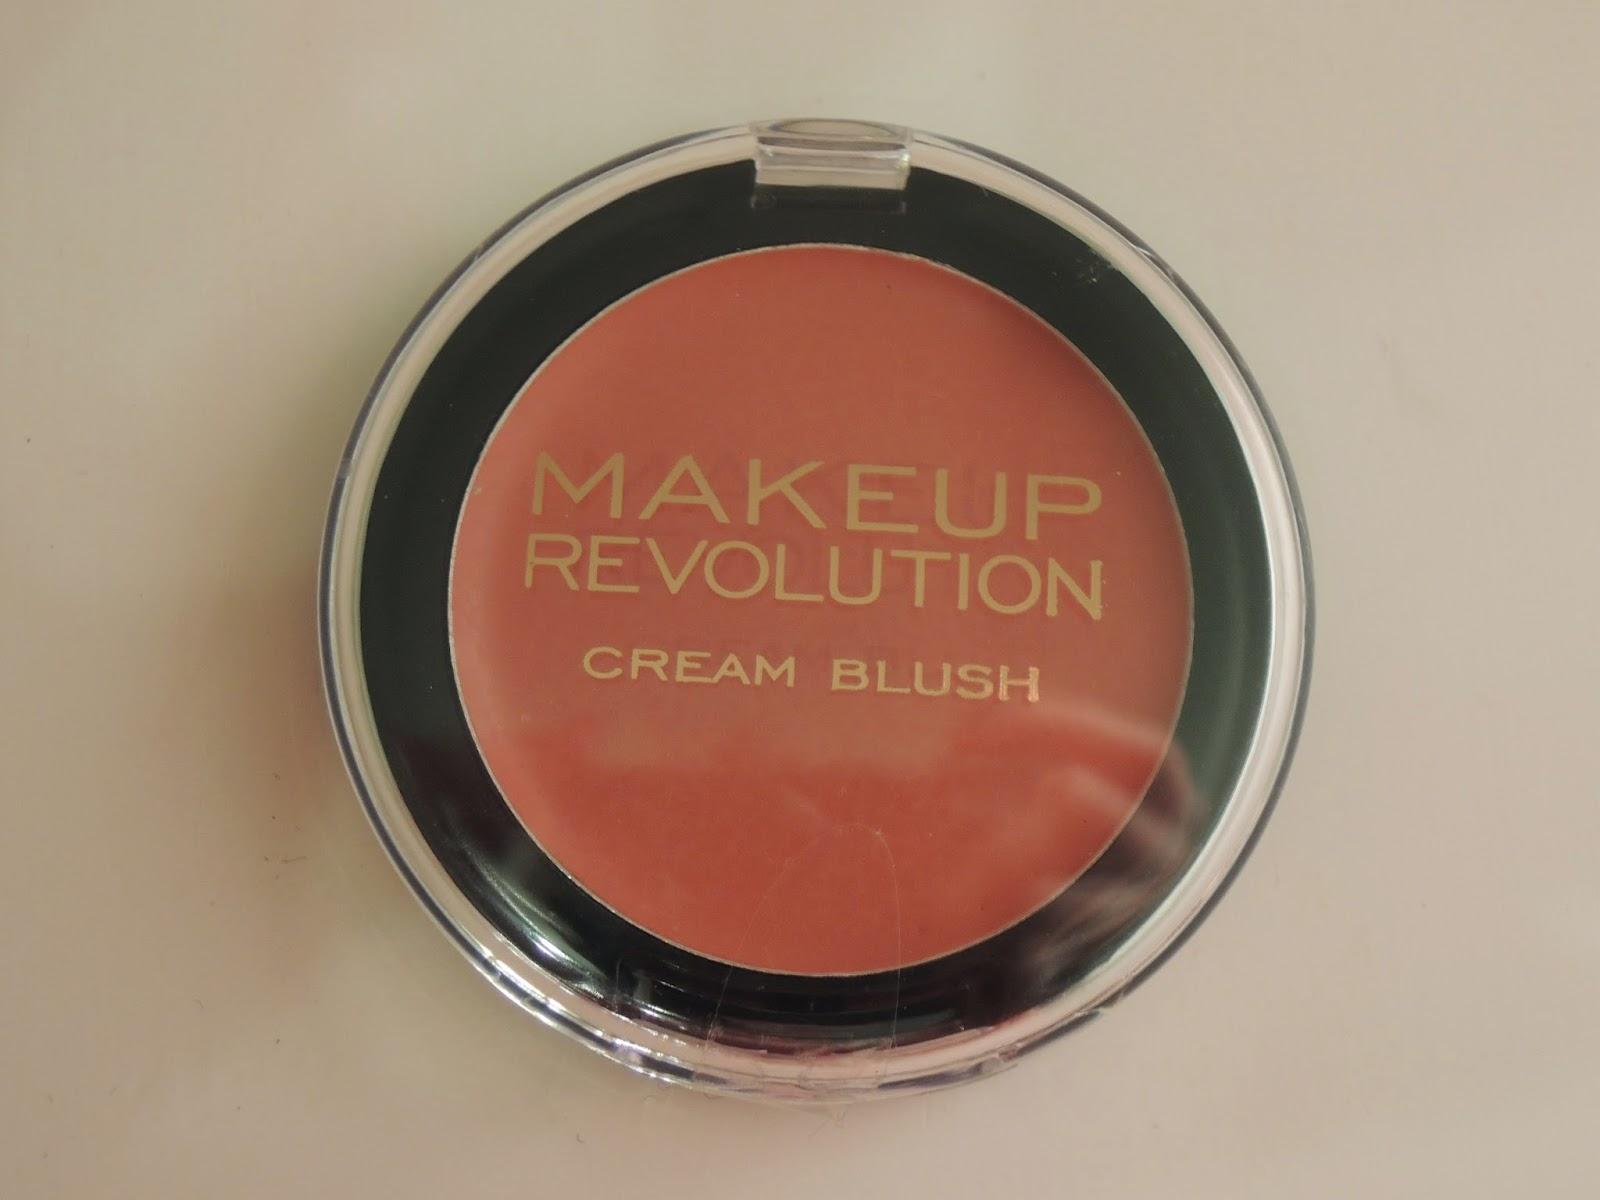 Małe, a cieszy- róż Rose Cream od Makeup Revolution